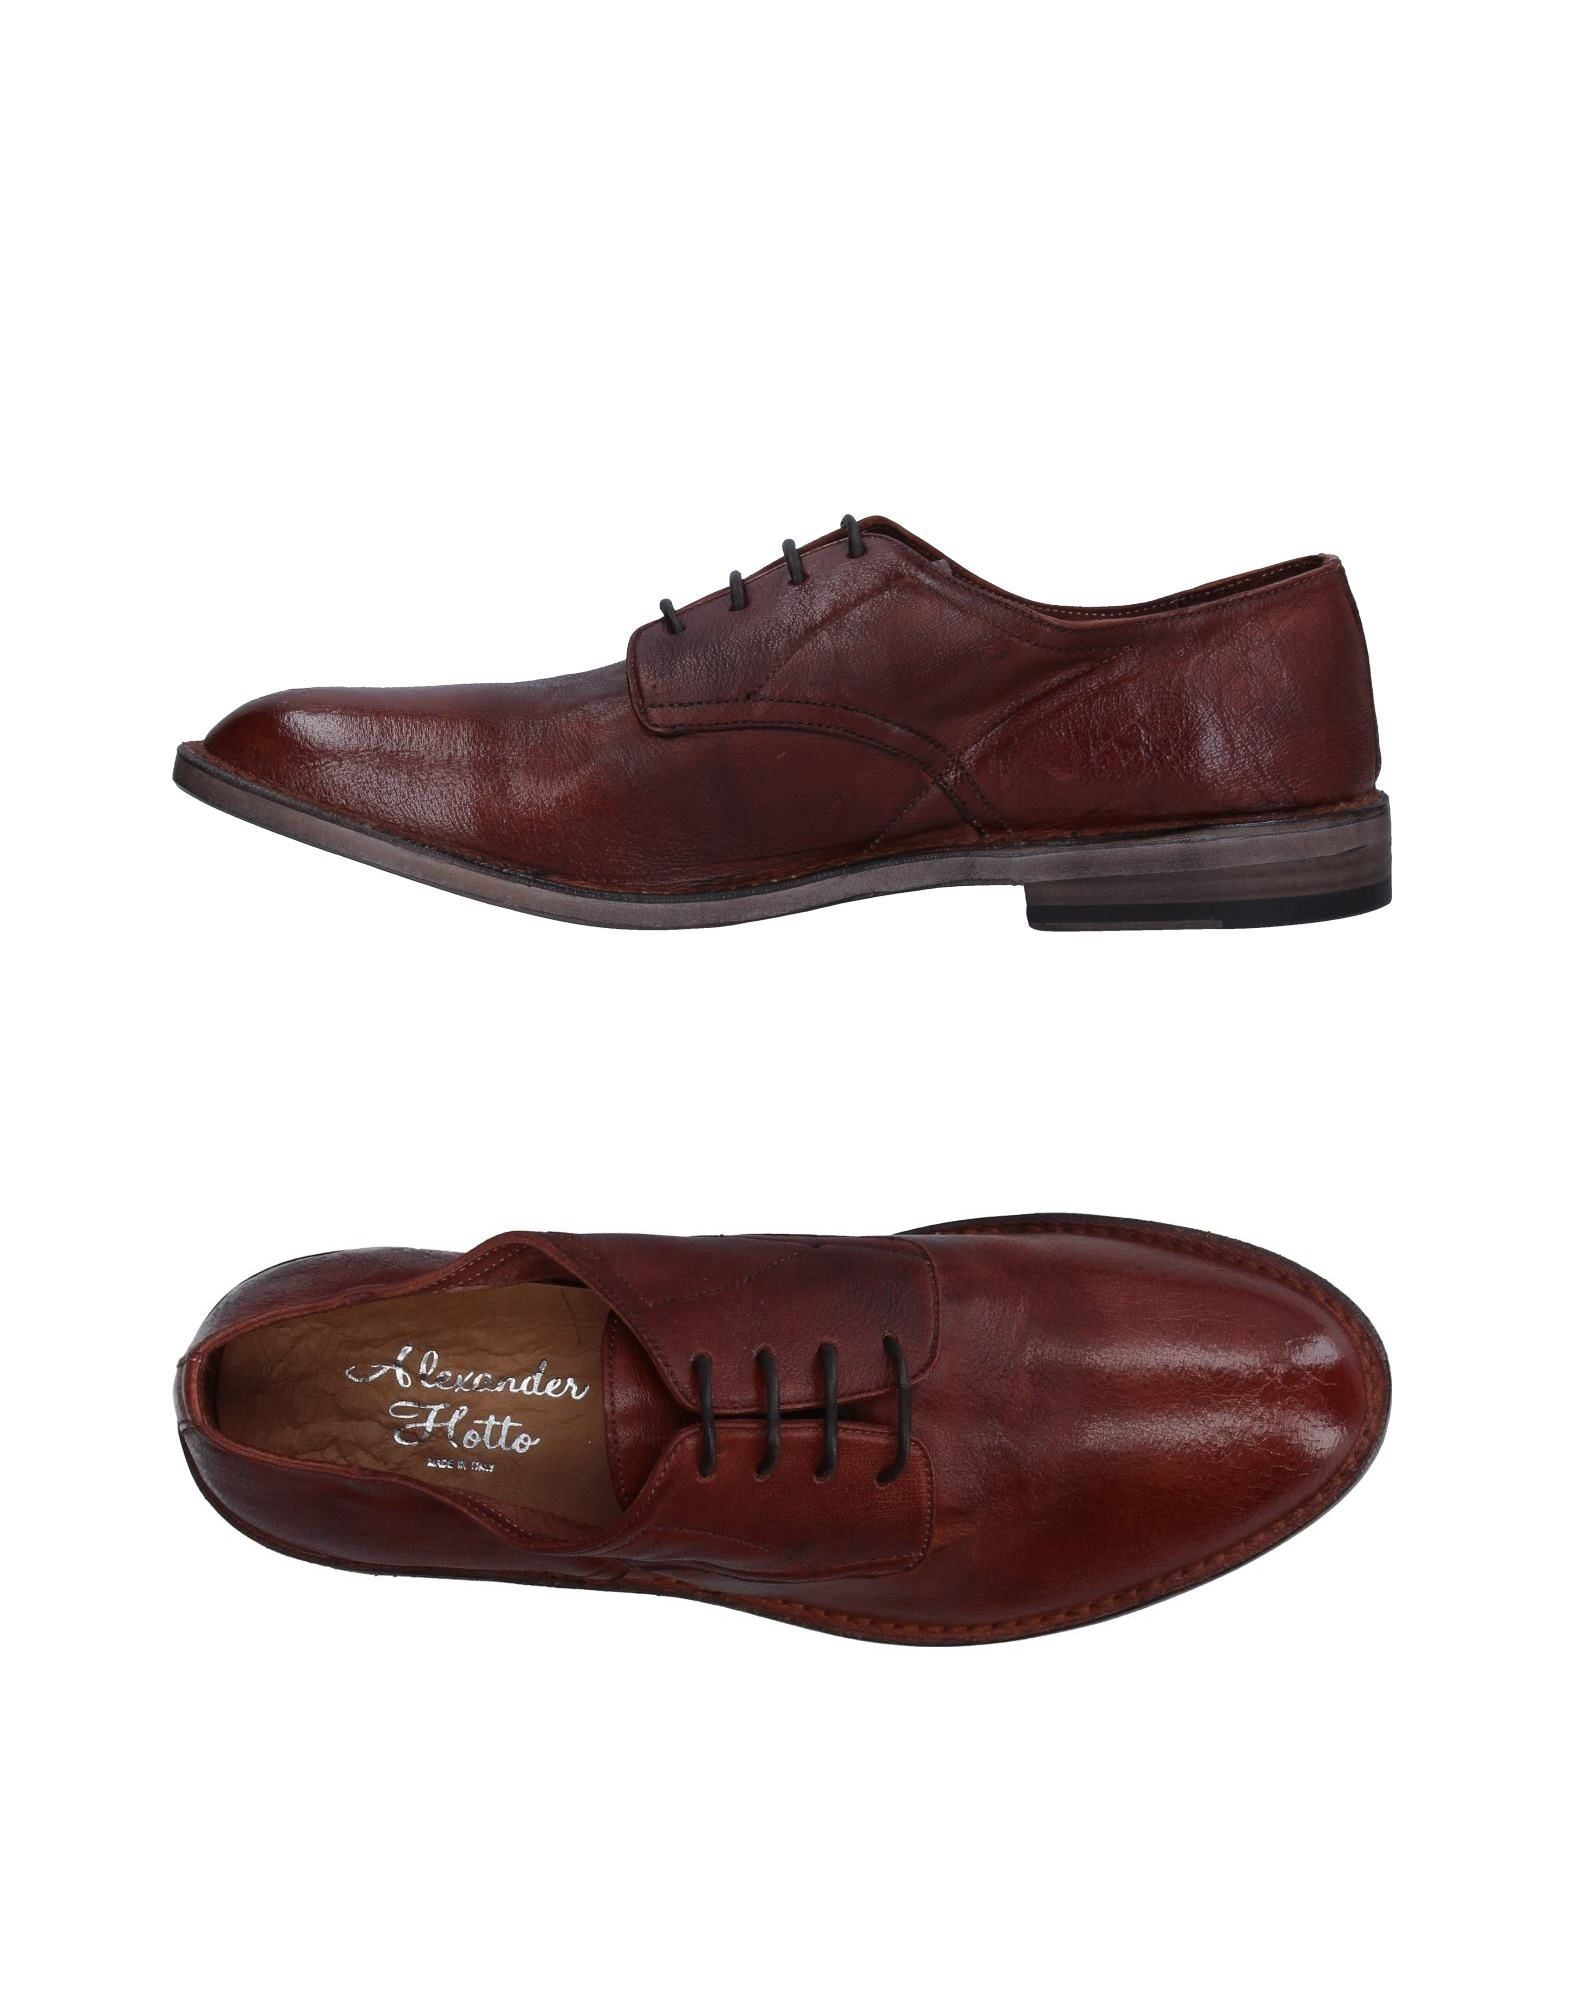 ФОТО alexander hotto Обувь на шнурках